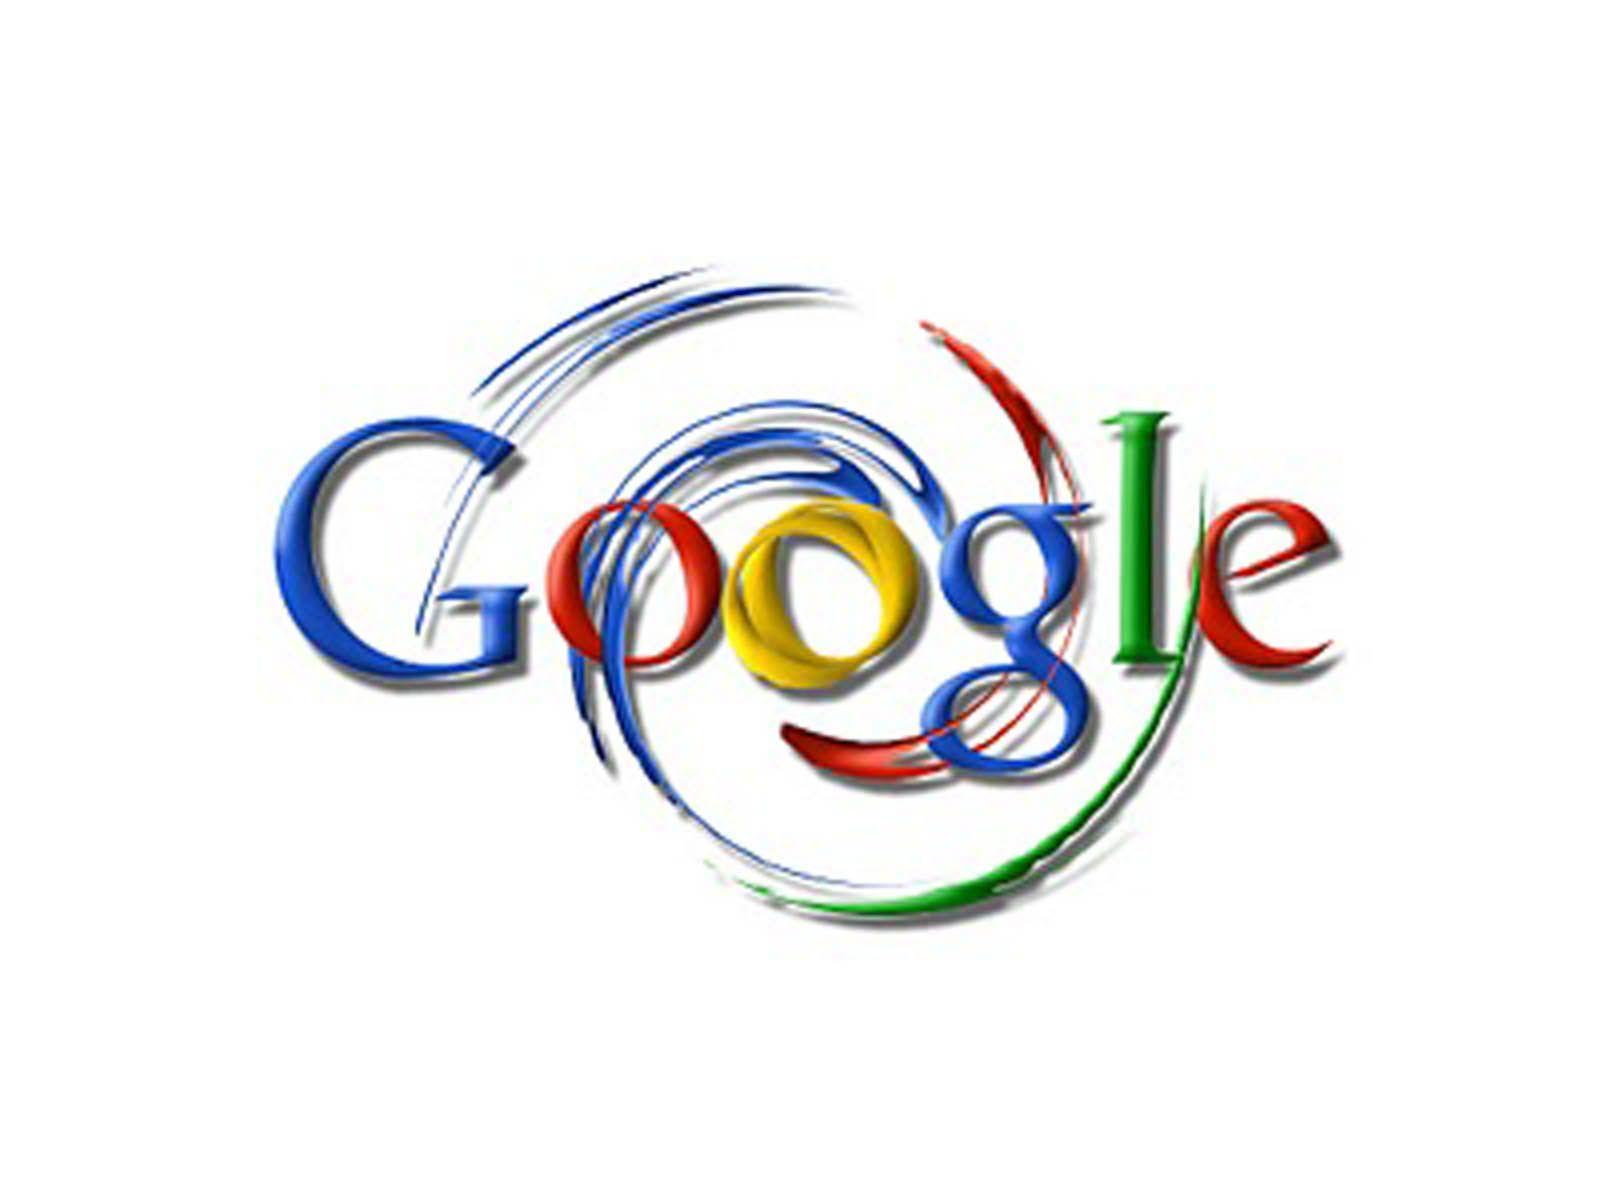 Google chromebook user guide pdf